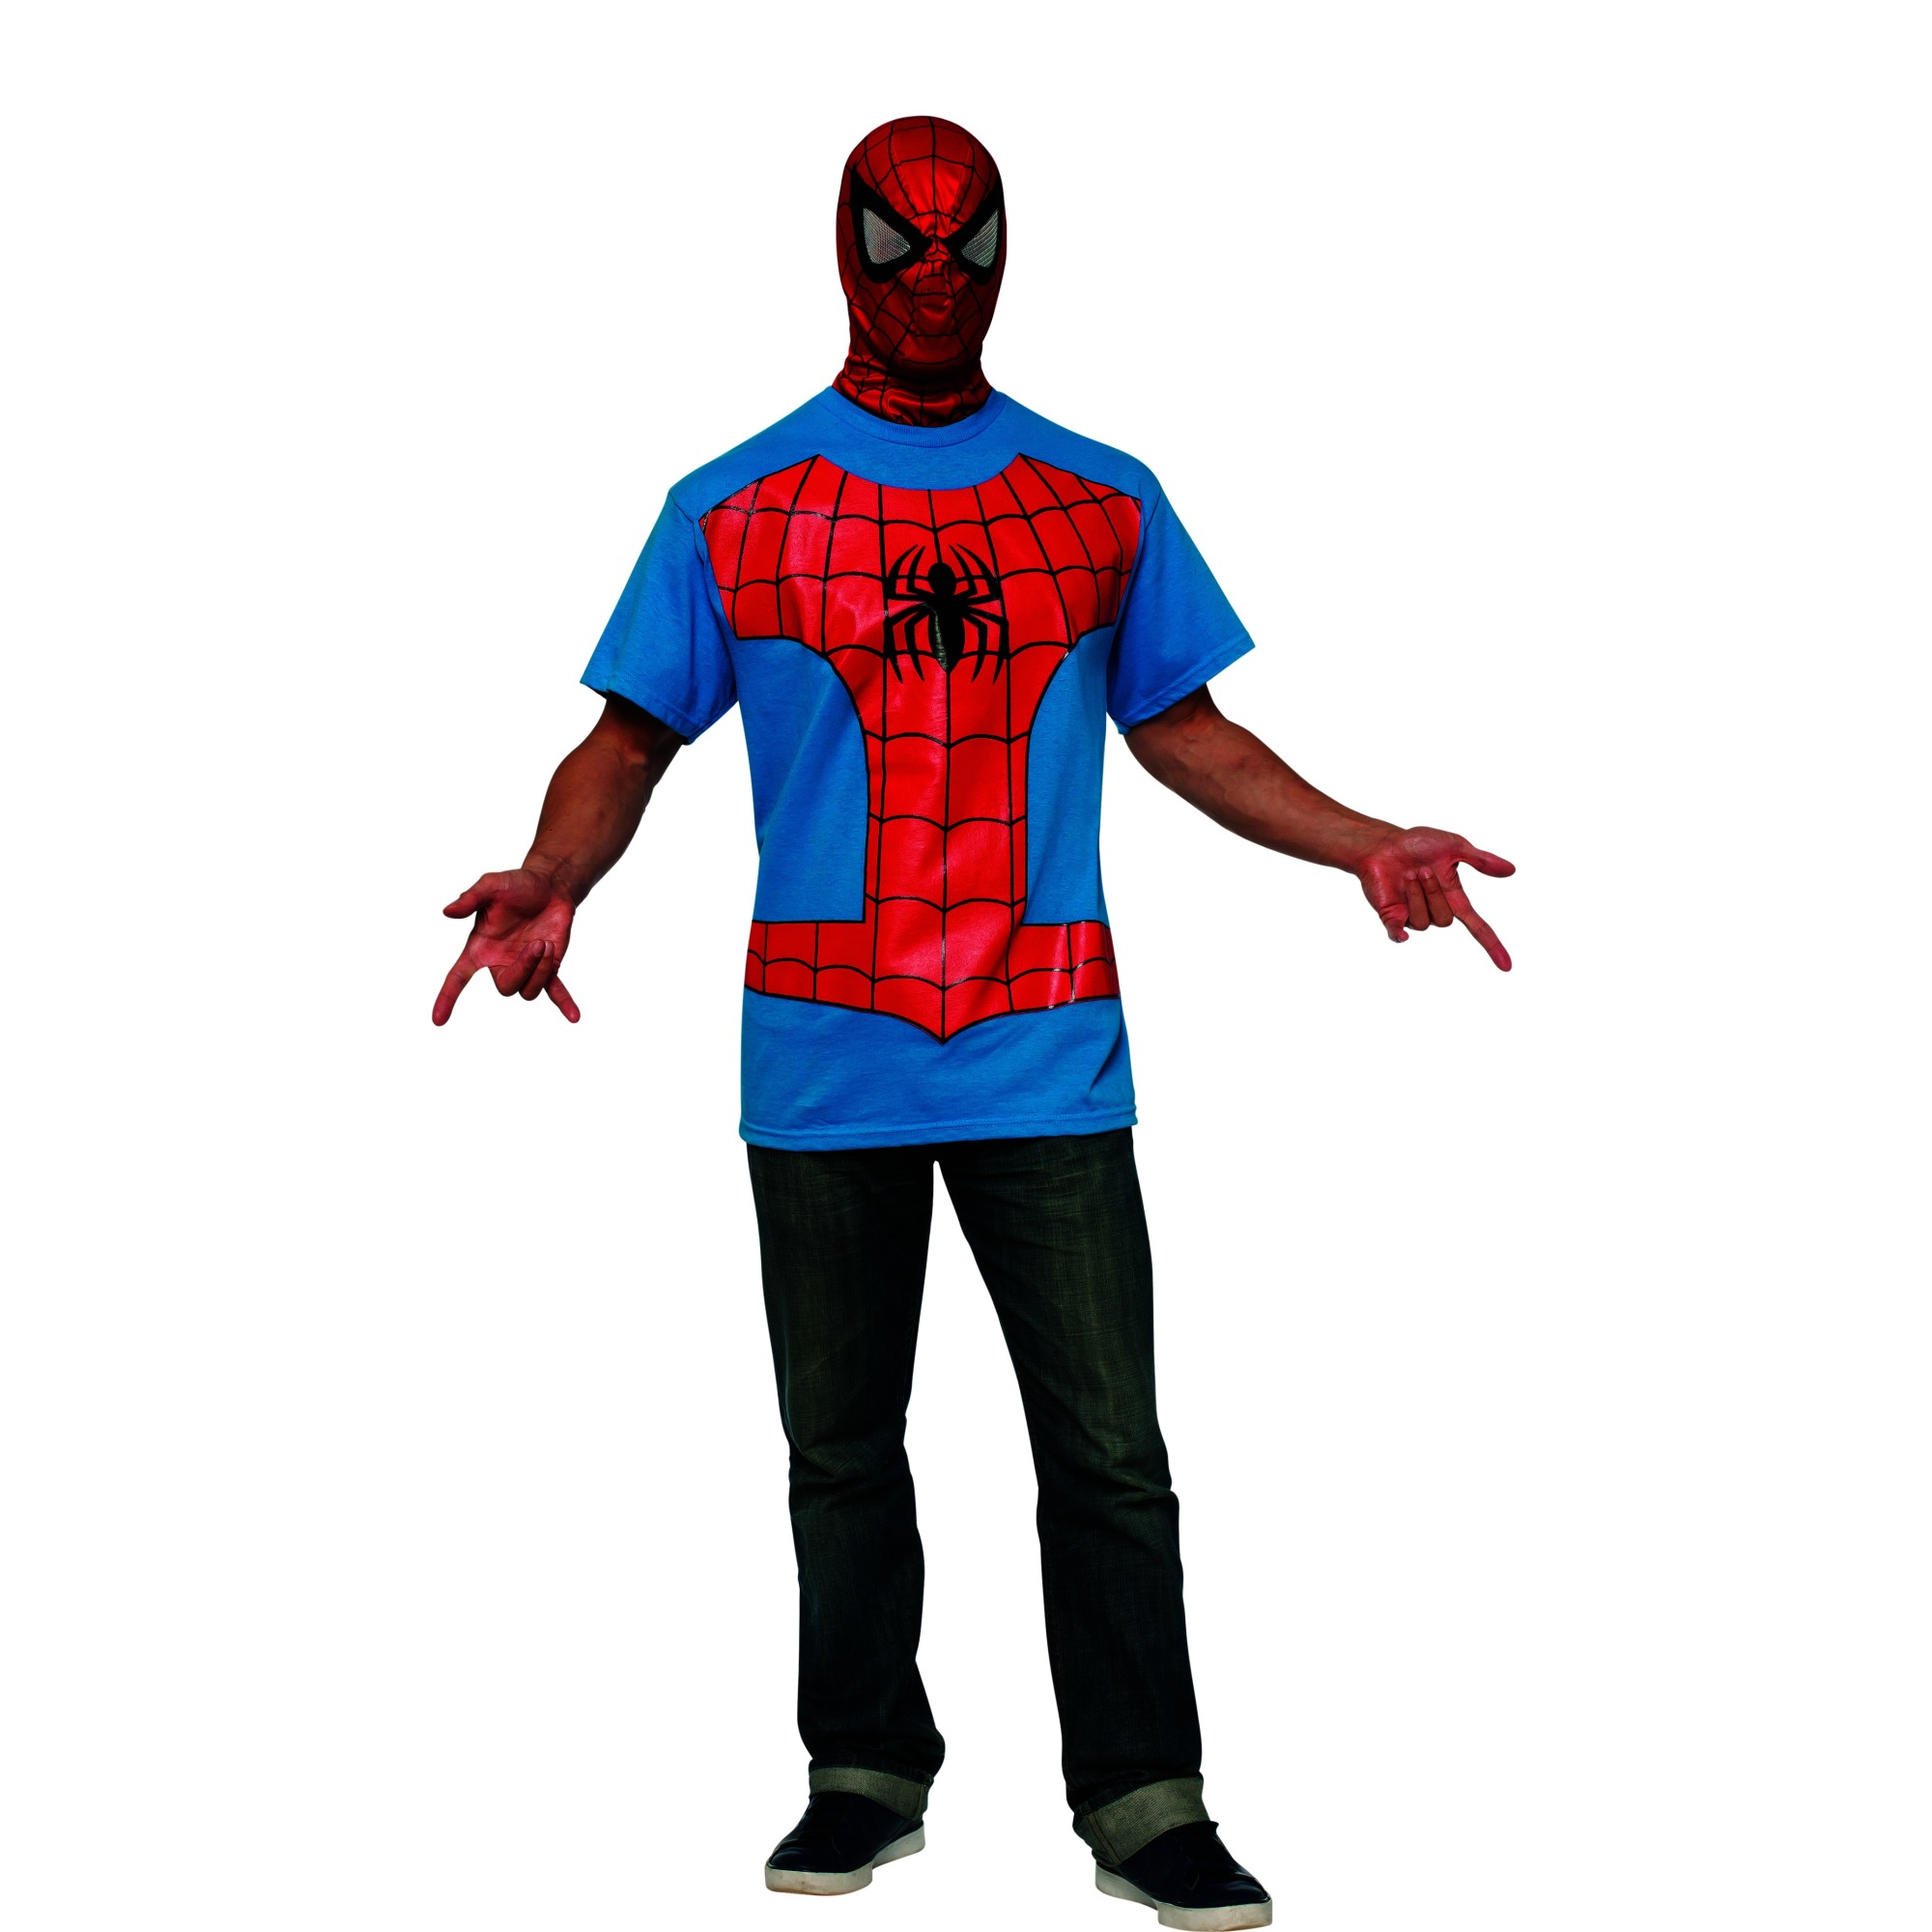 Marvel Classic Spider-Man Adult T-Shirt Kit Men's Adult Halloween Costume